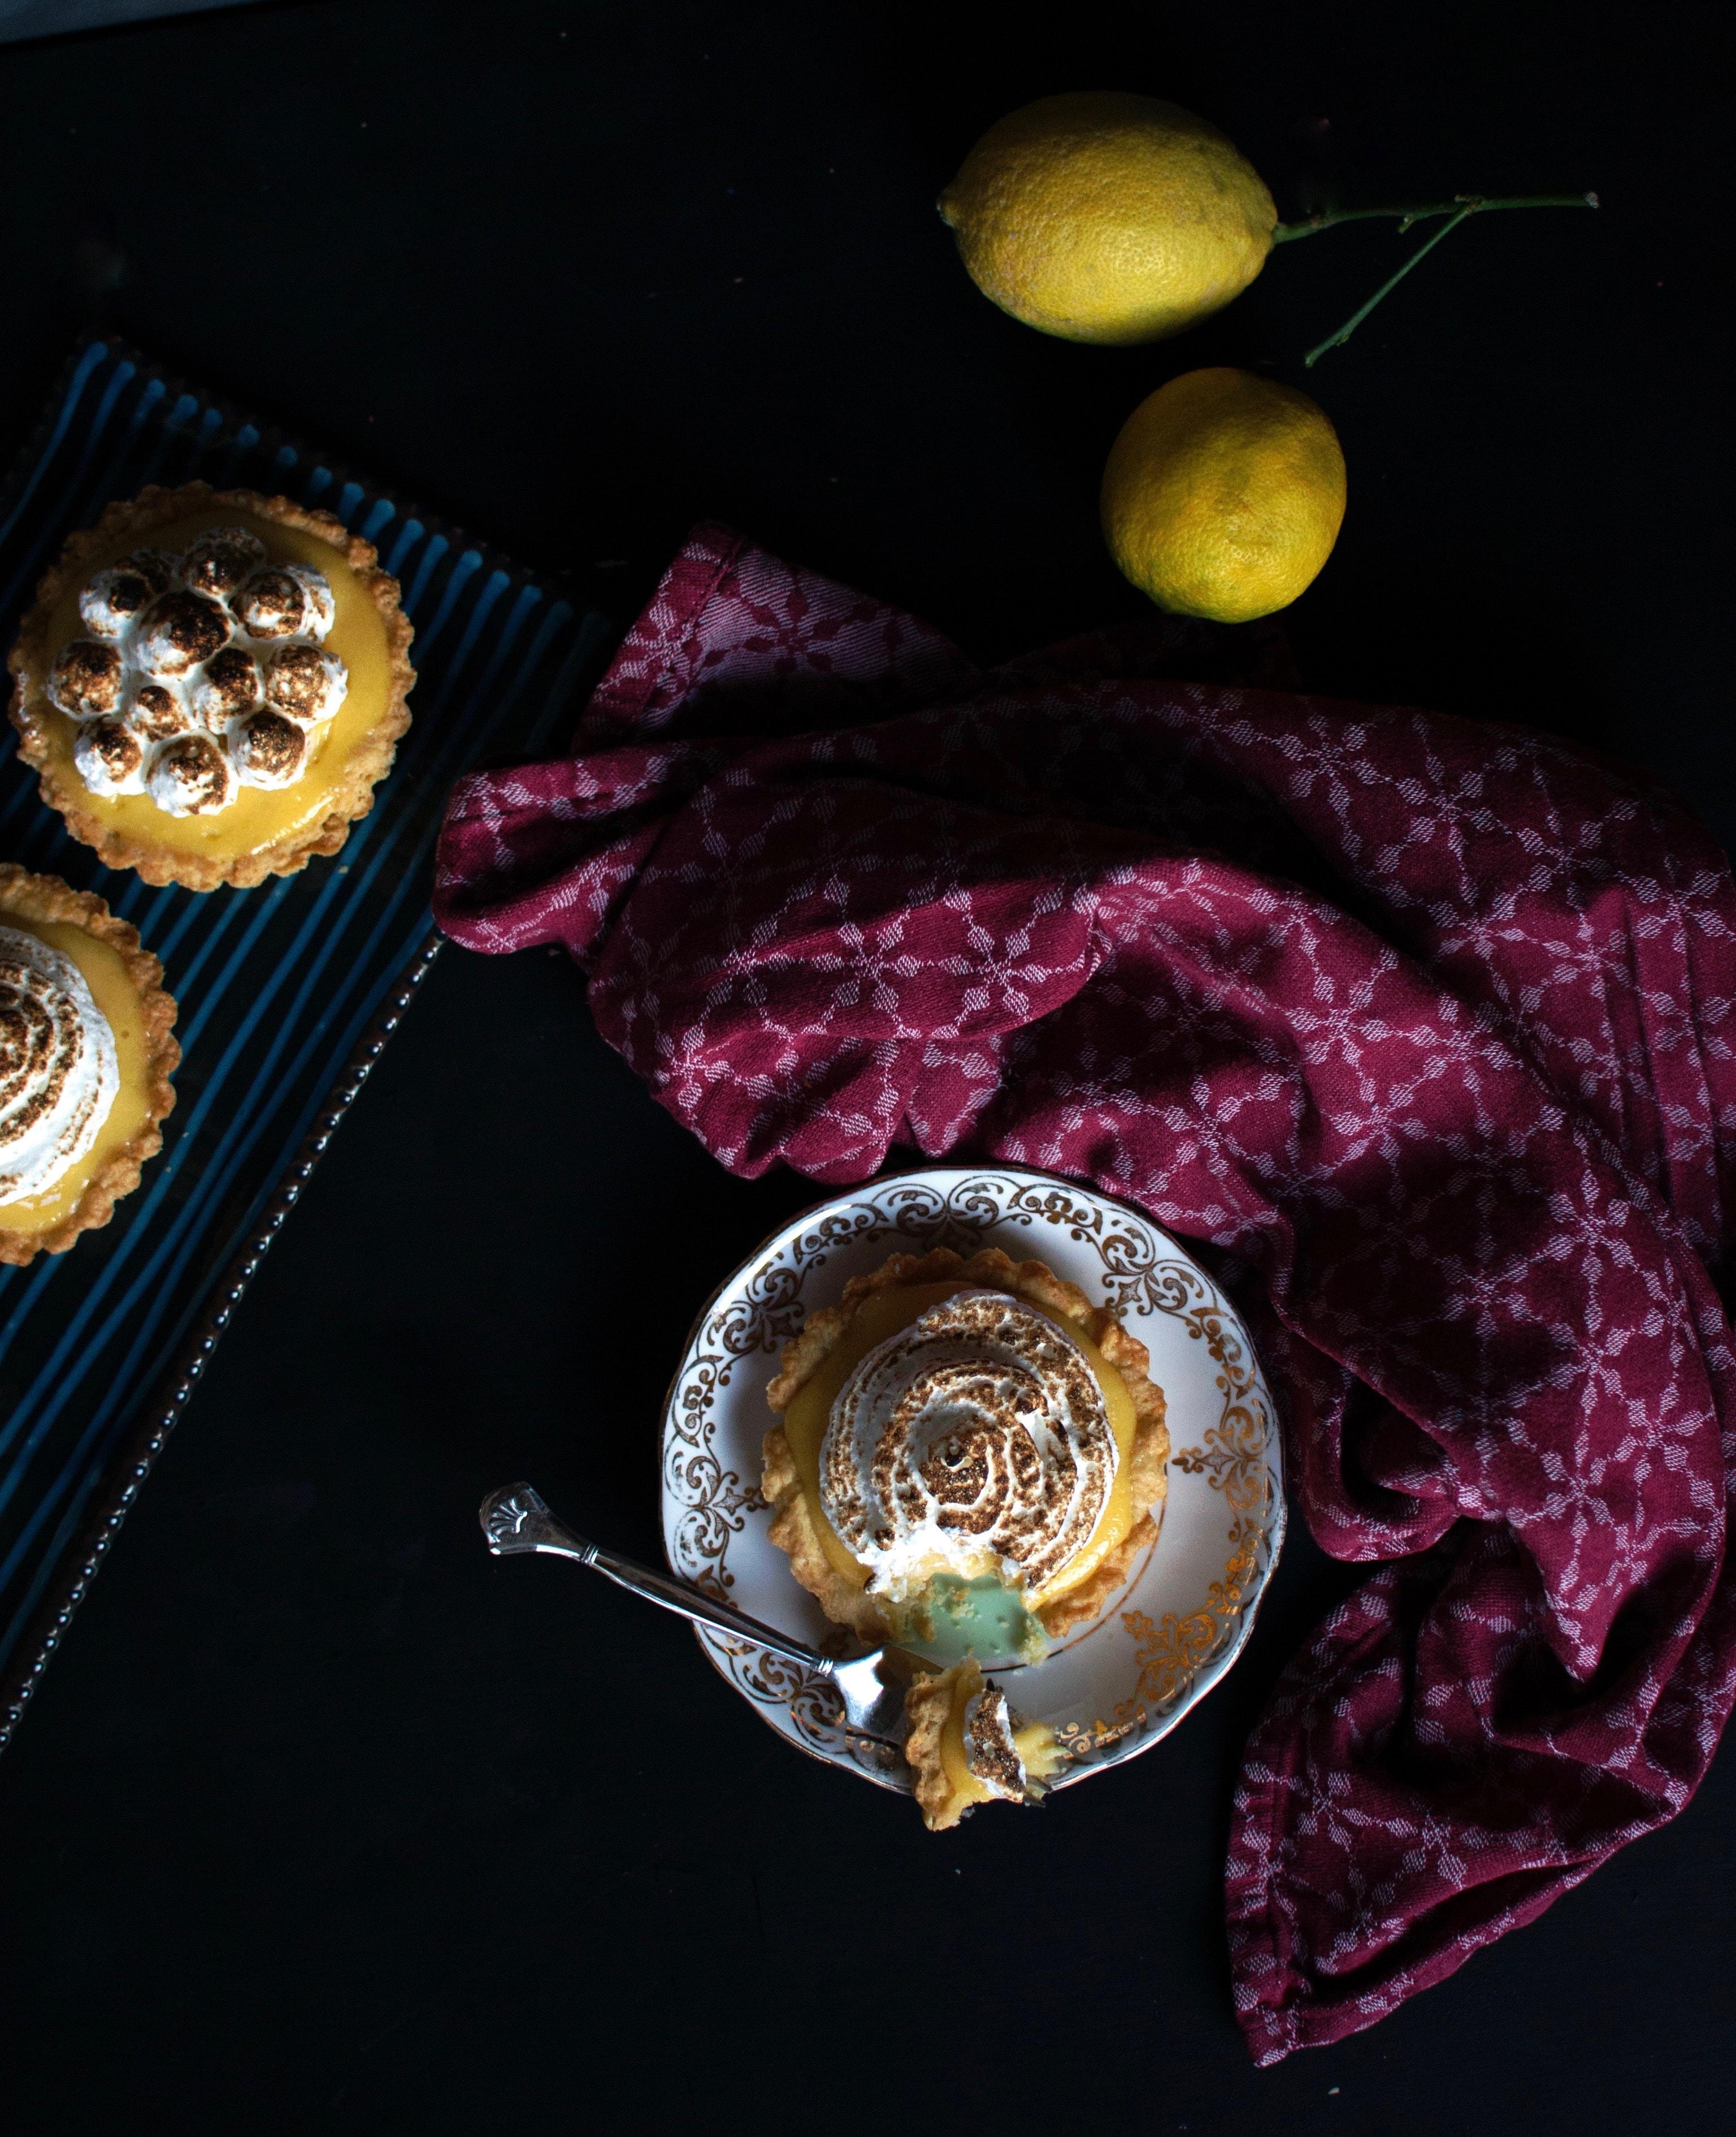 Tartelettes au Citron – himmlische Zitronentartelettes